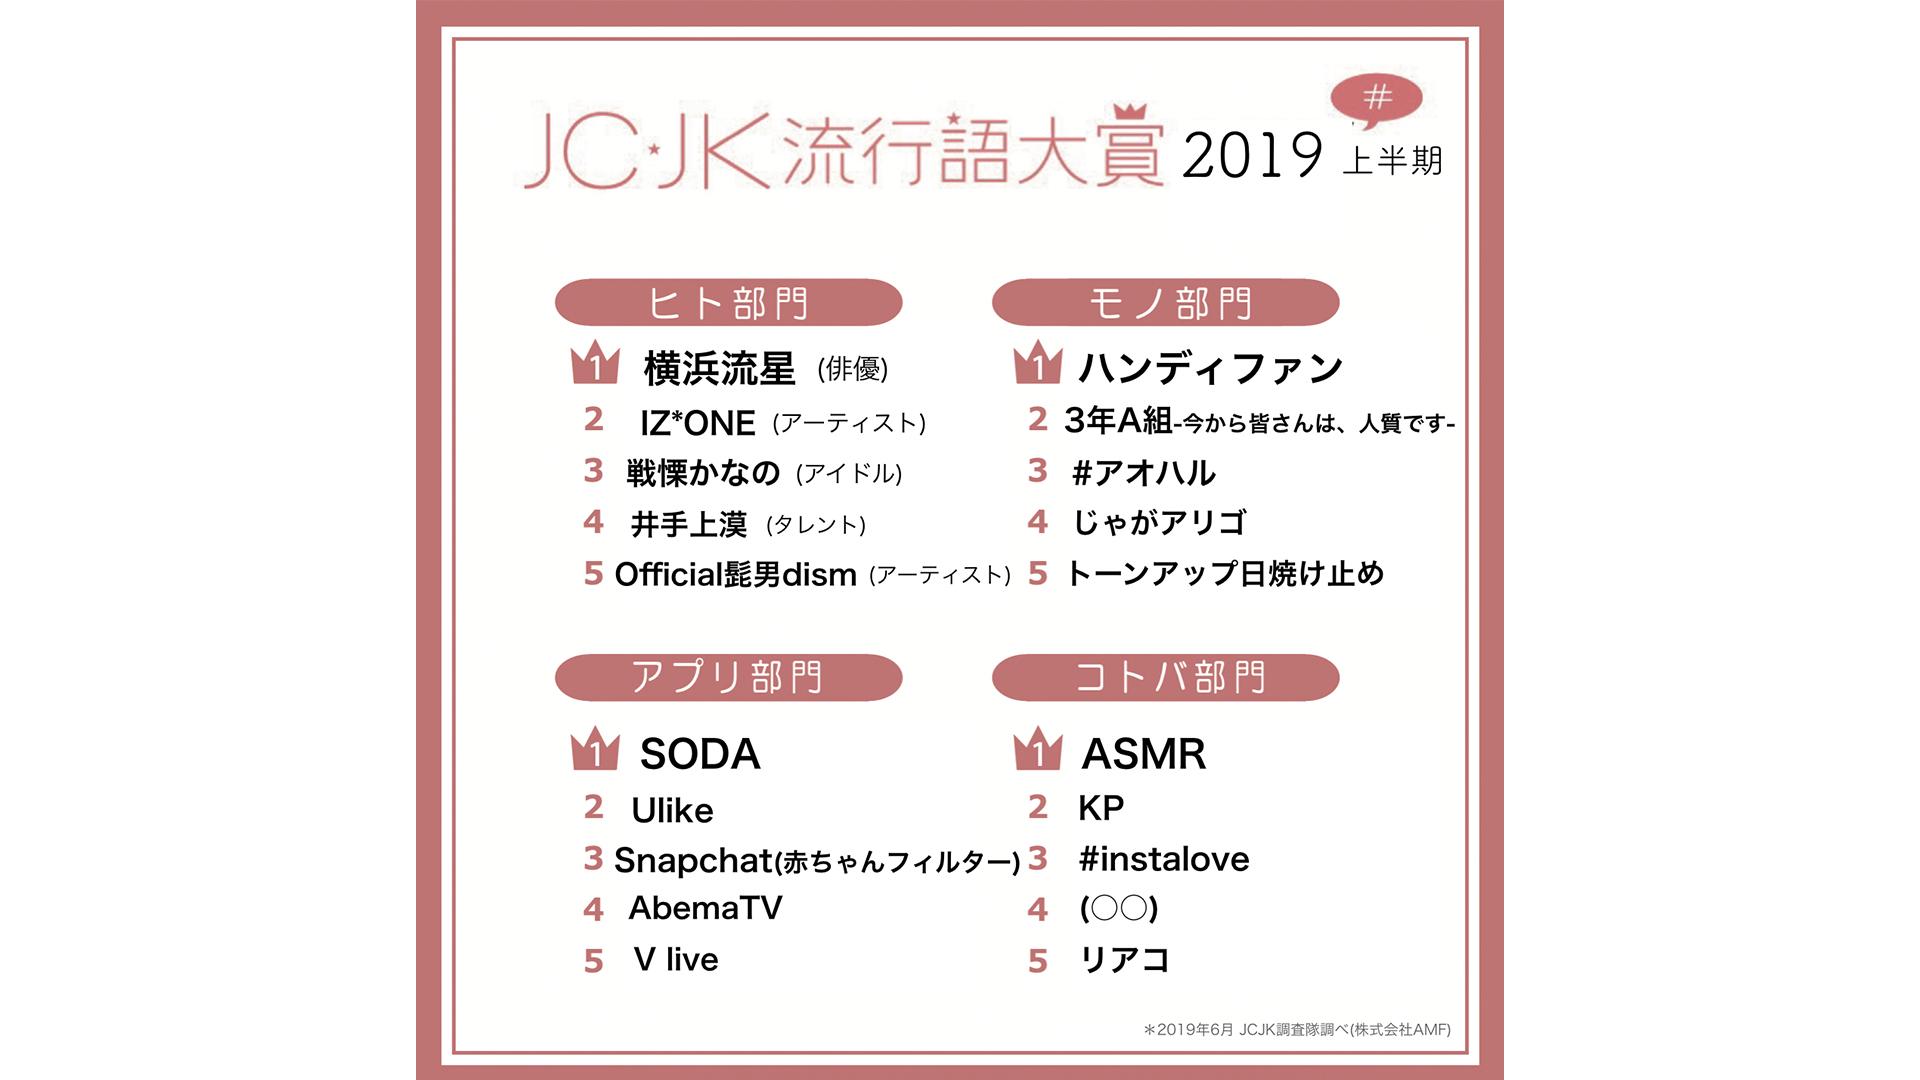 【JC・JK流行語大賞 2019年上半期を発表】他、新着トレンド7月4日